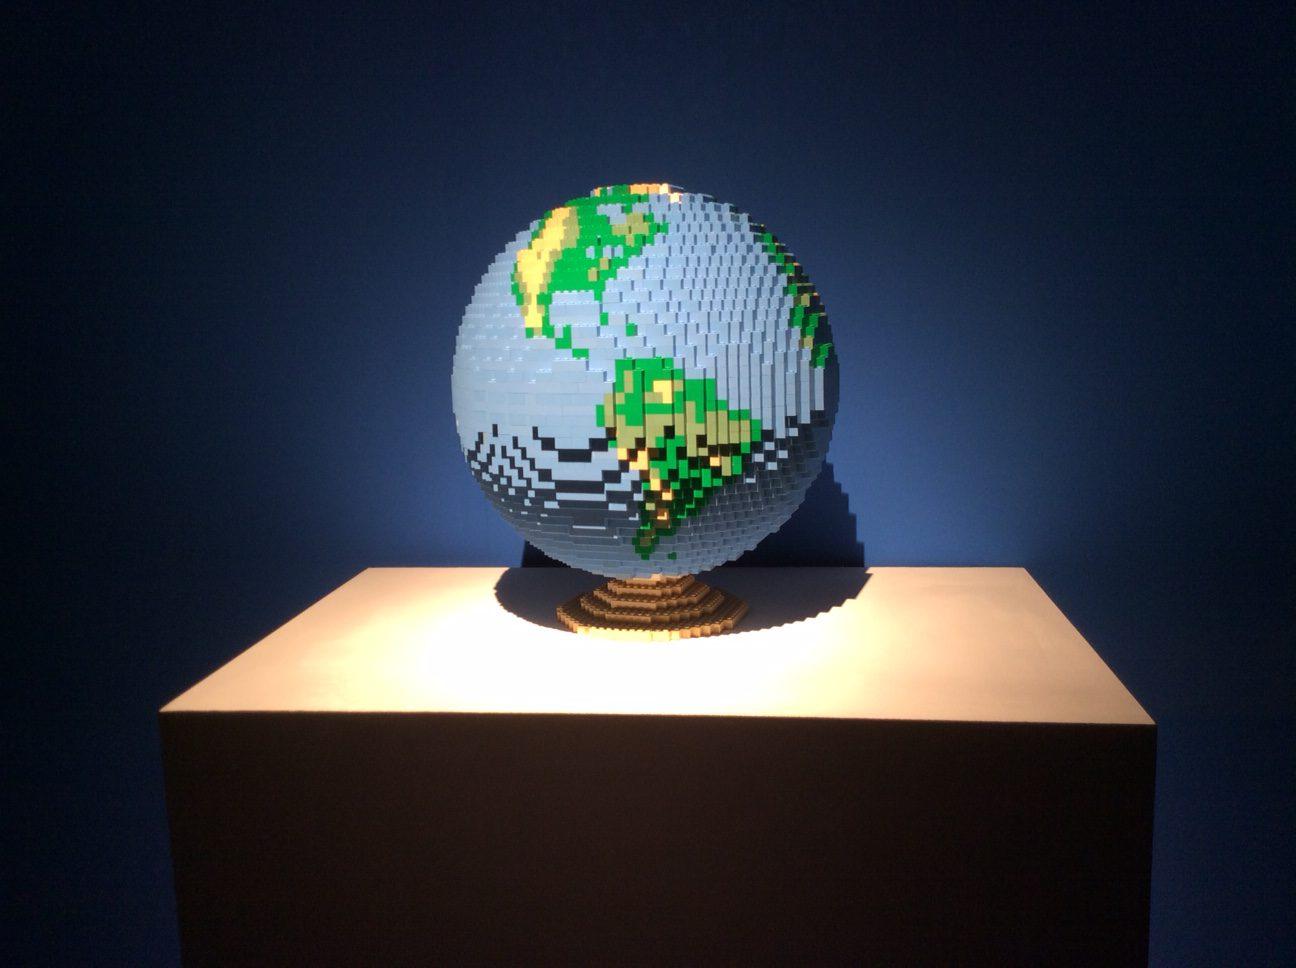 Art of the brick lego ausstellung globus aus lego welt